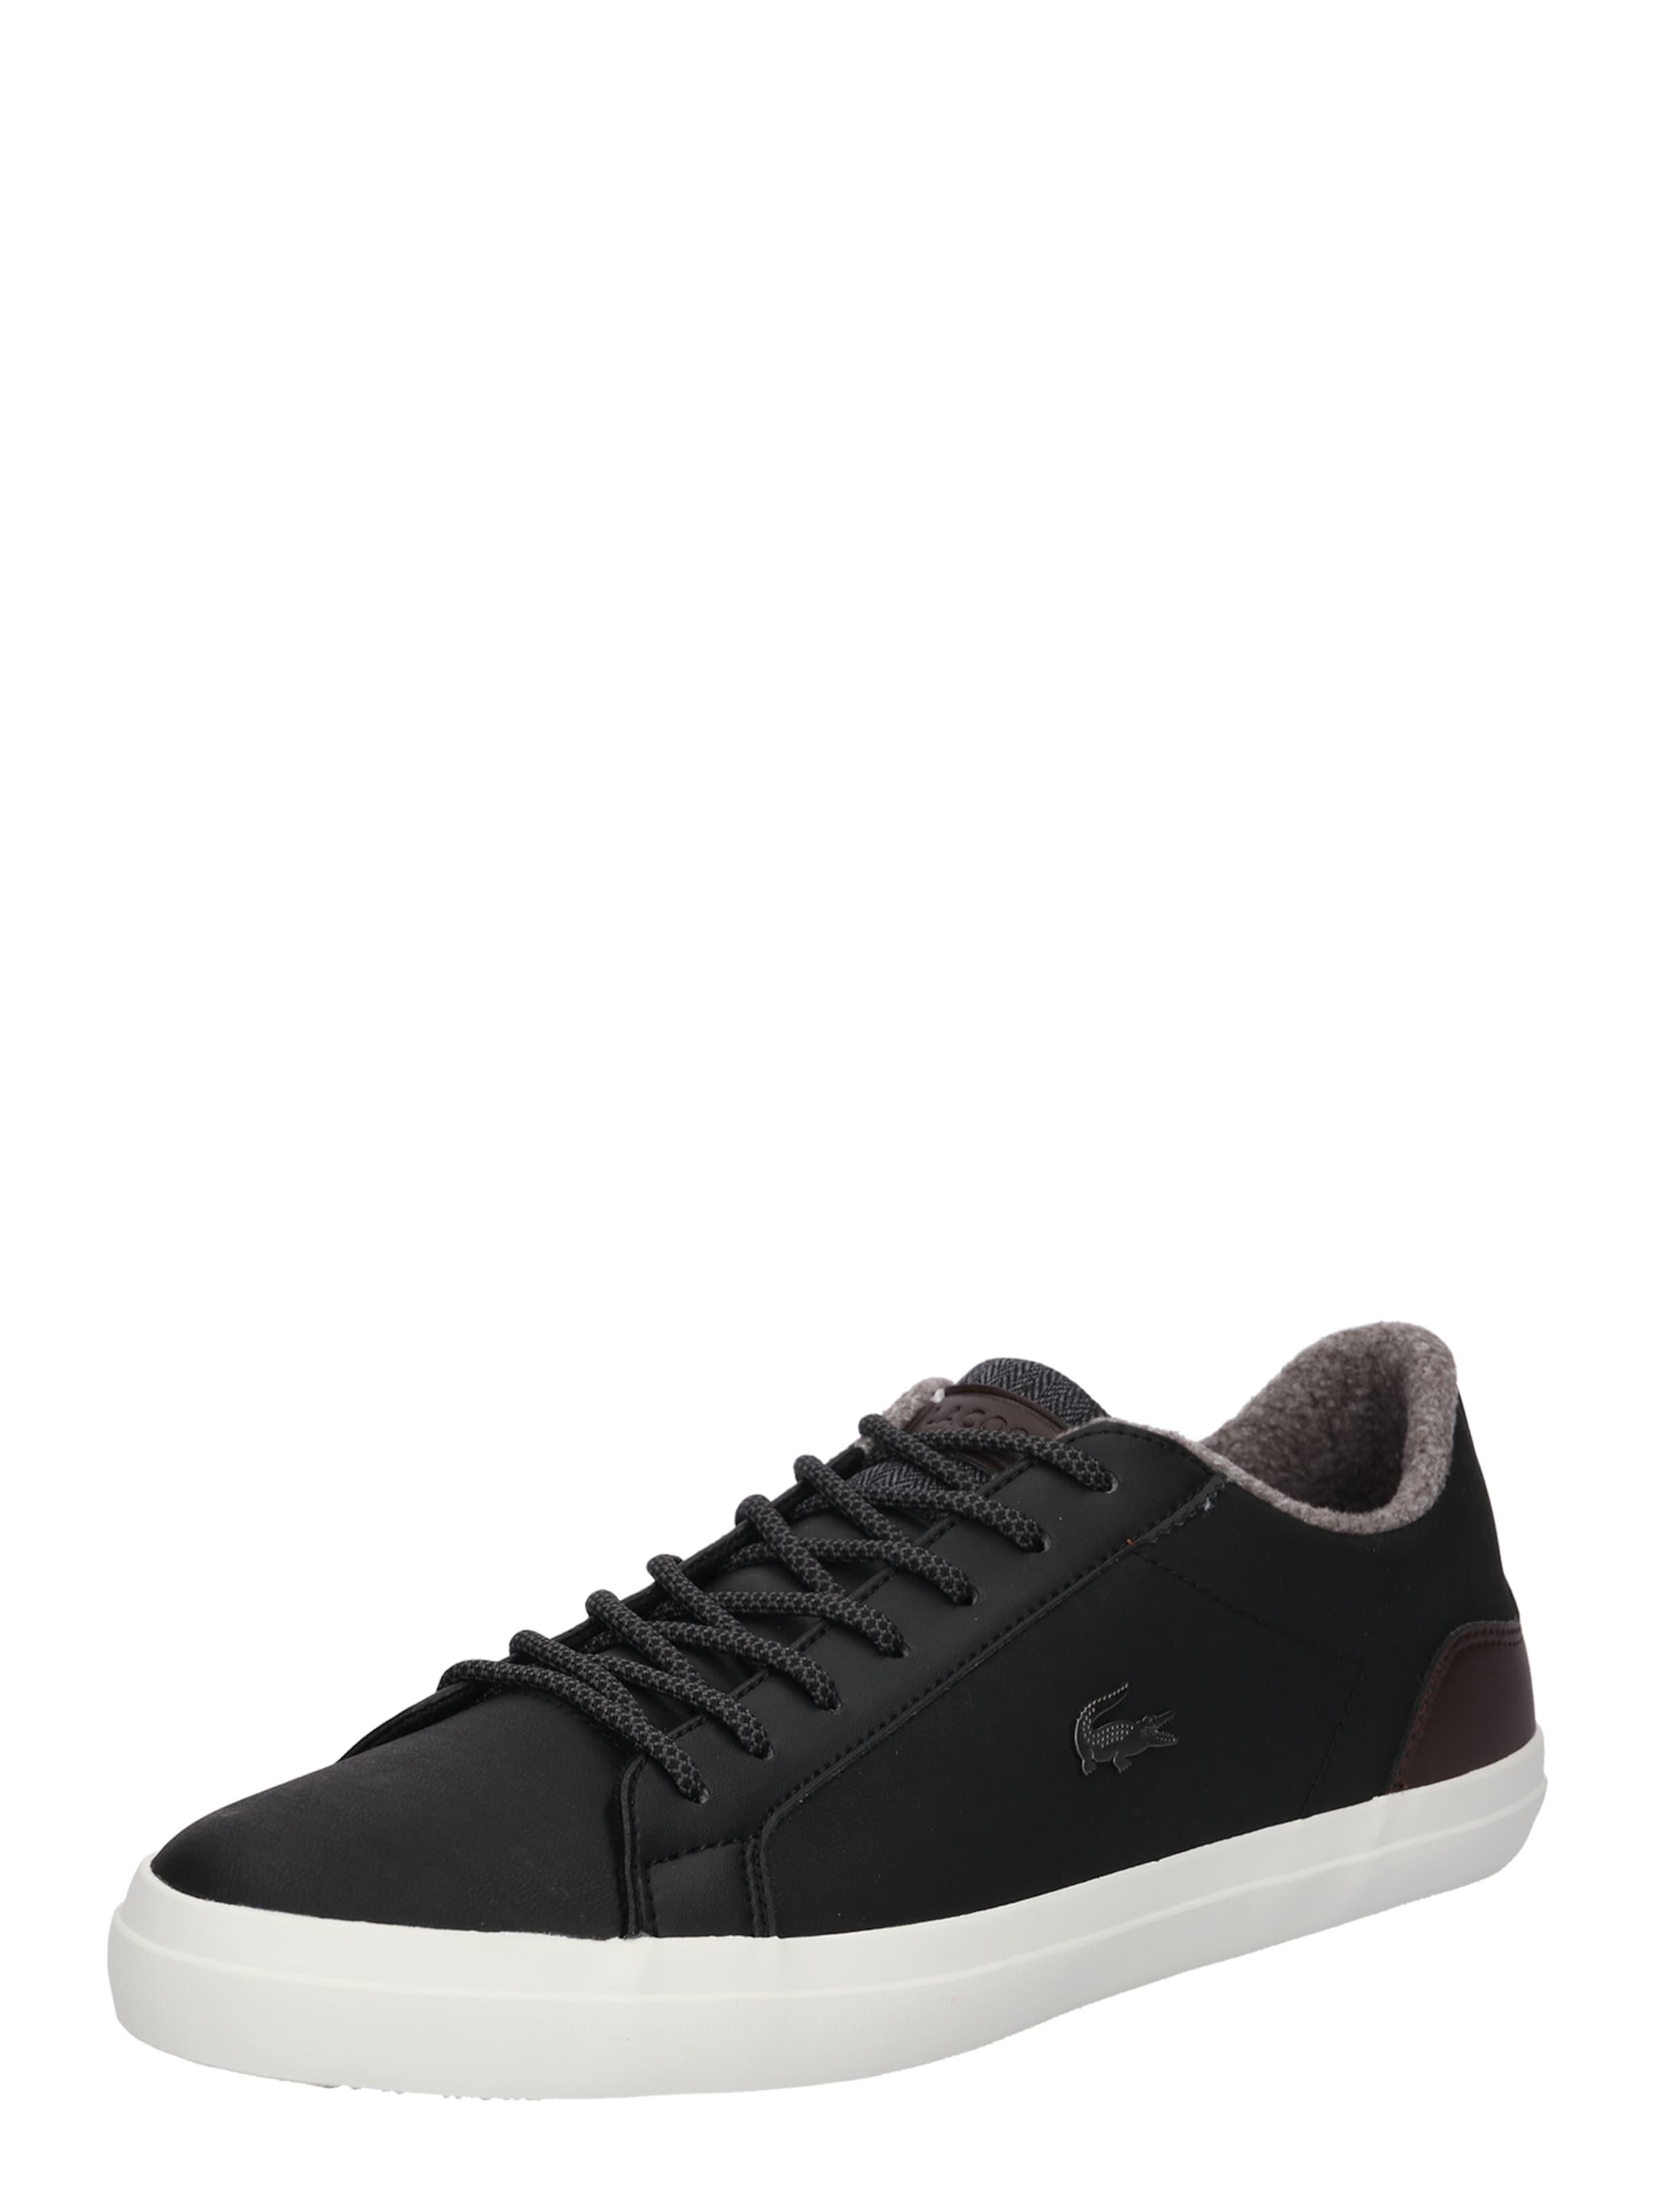 Haltbare Mode billige Schuhe LACOSTE   Sneaker Low 'LEROND' Schuhe Gut getragene Schuhe